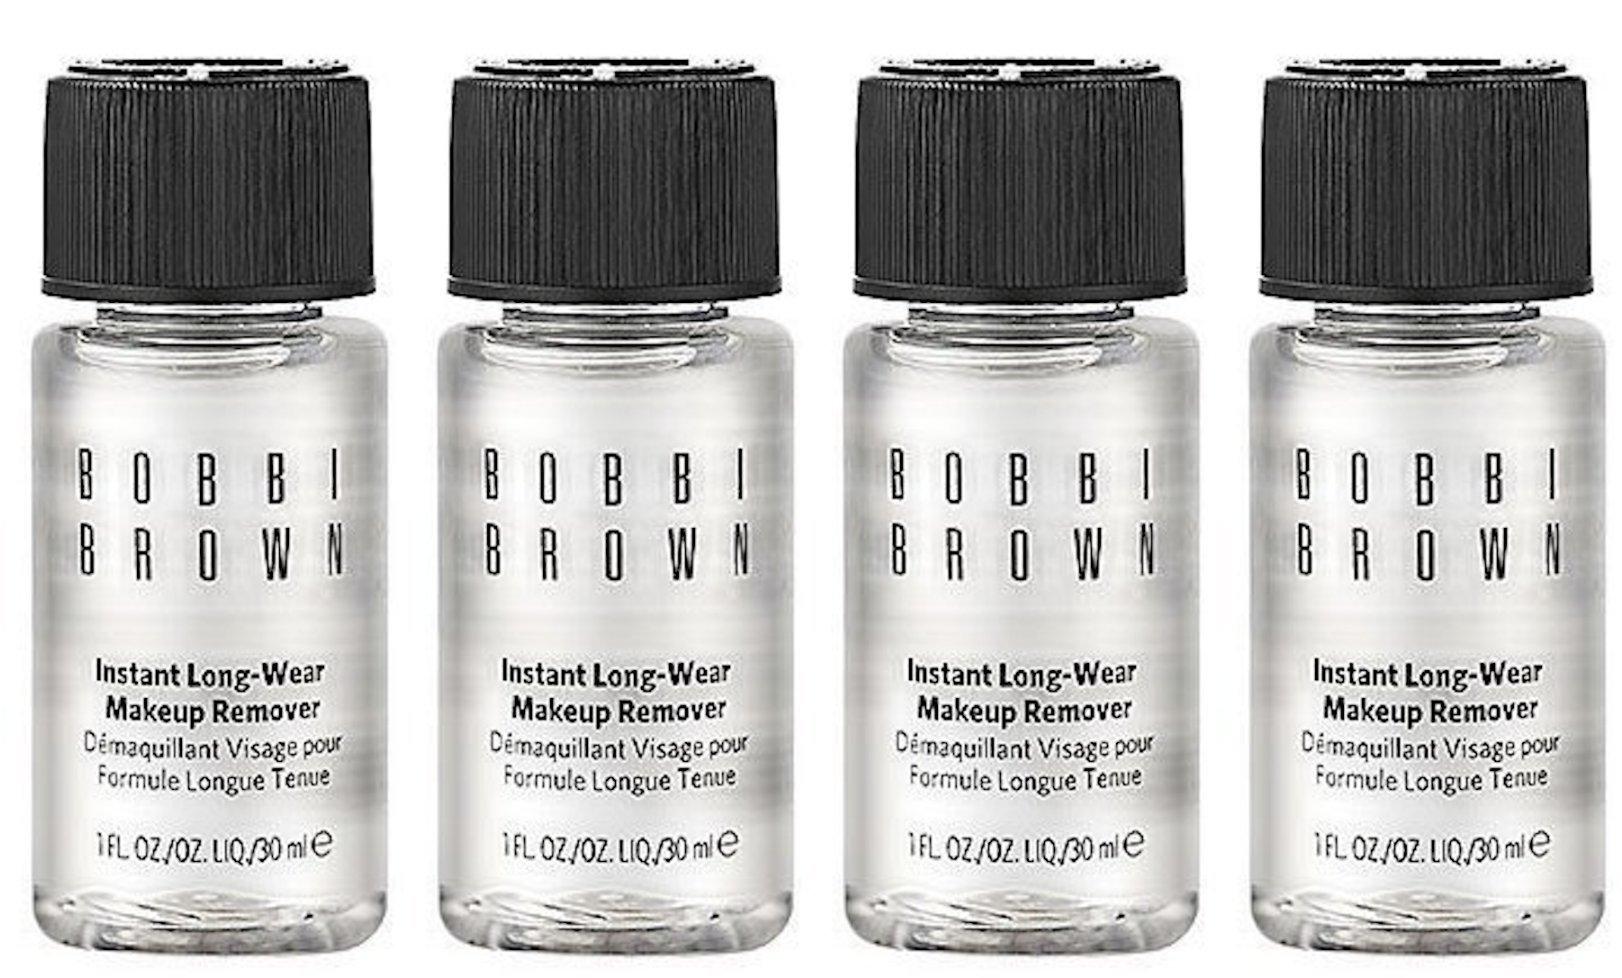 Bobbi Brown Instant Long-Wear Makeup Remover 1oz/30ml Each Lot of 4 by Bobbi Brown